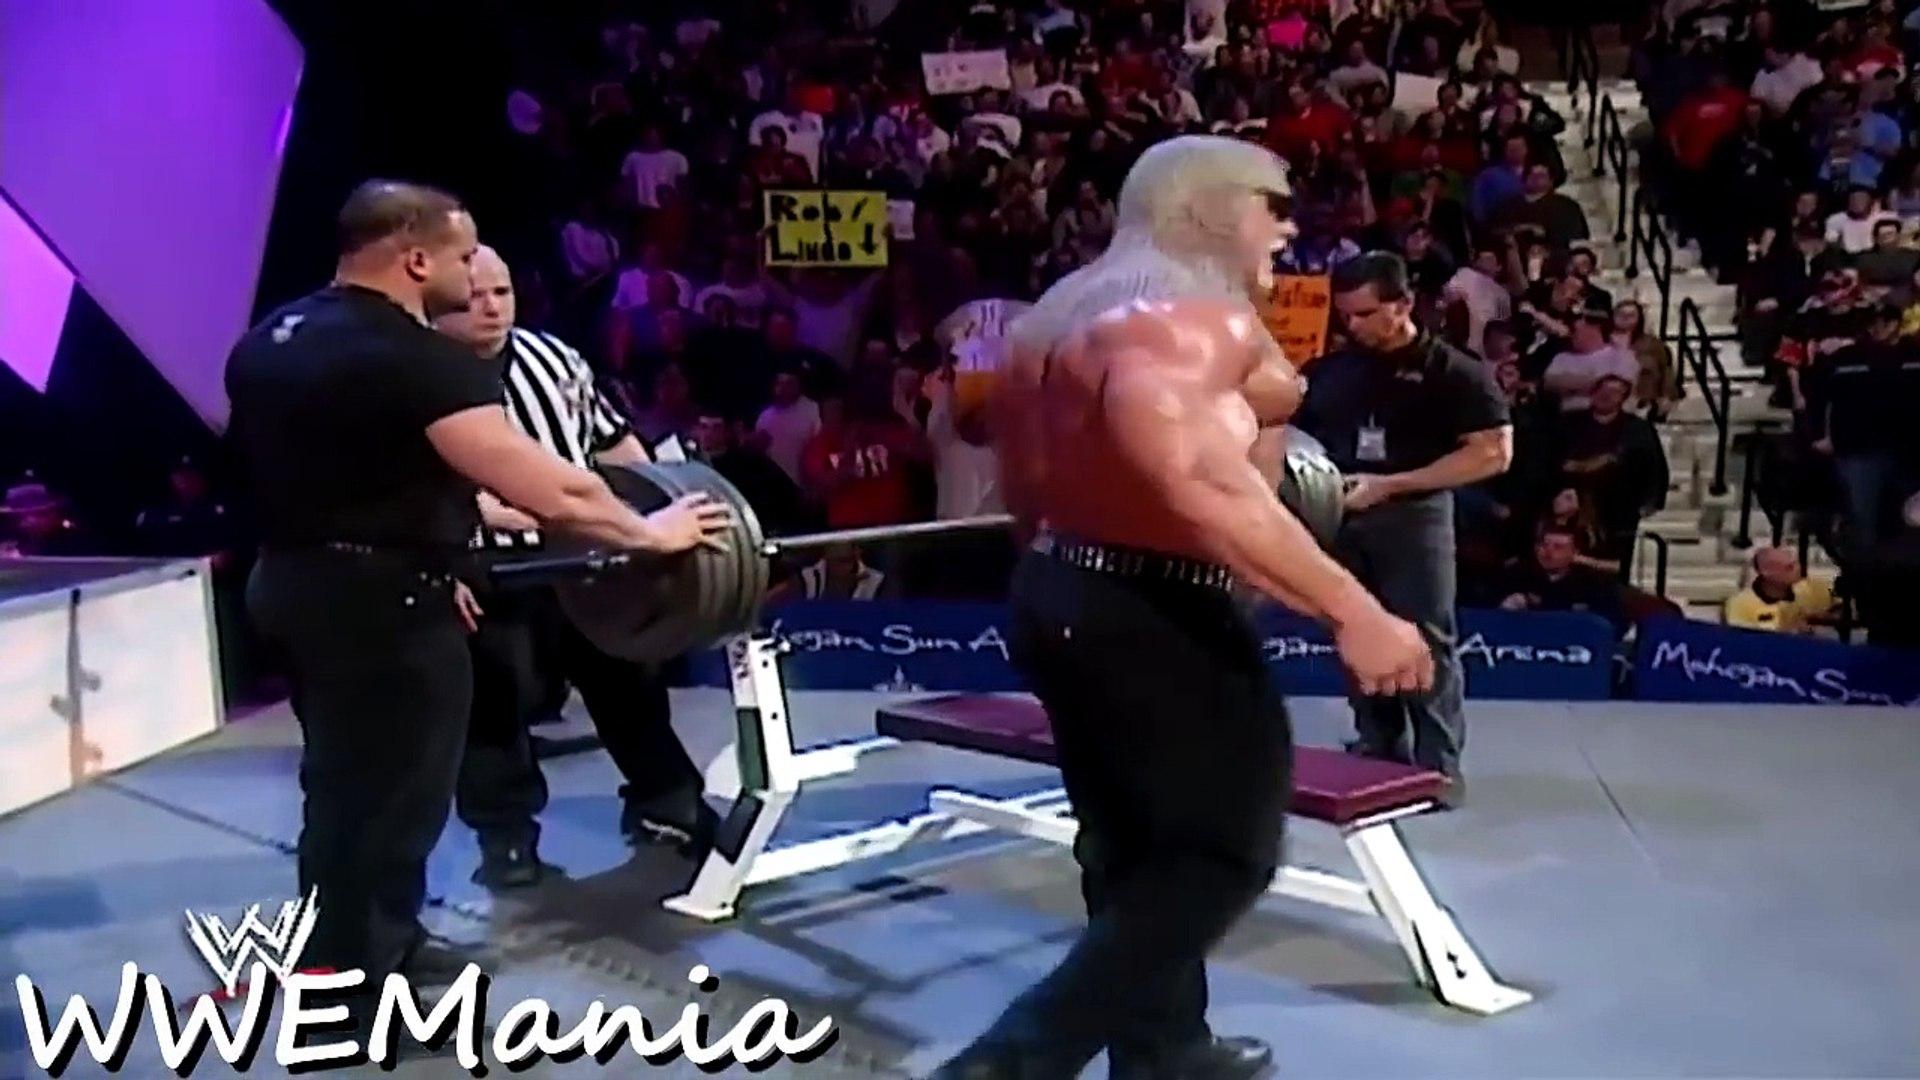 WWE Triple H vs Scott Steiner - Bench Press Competition - RAW 2003